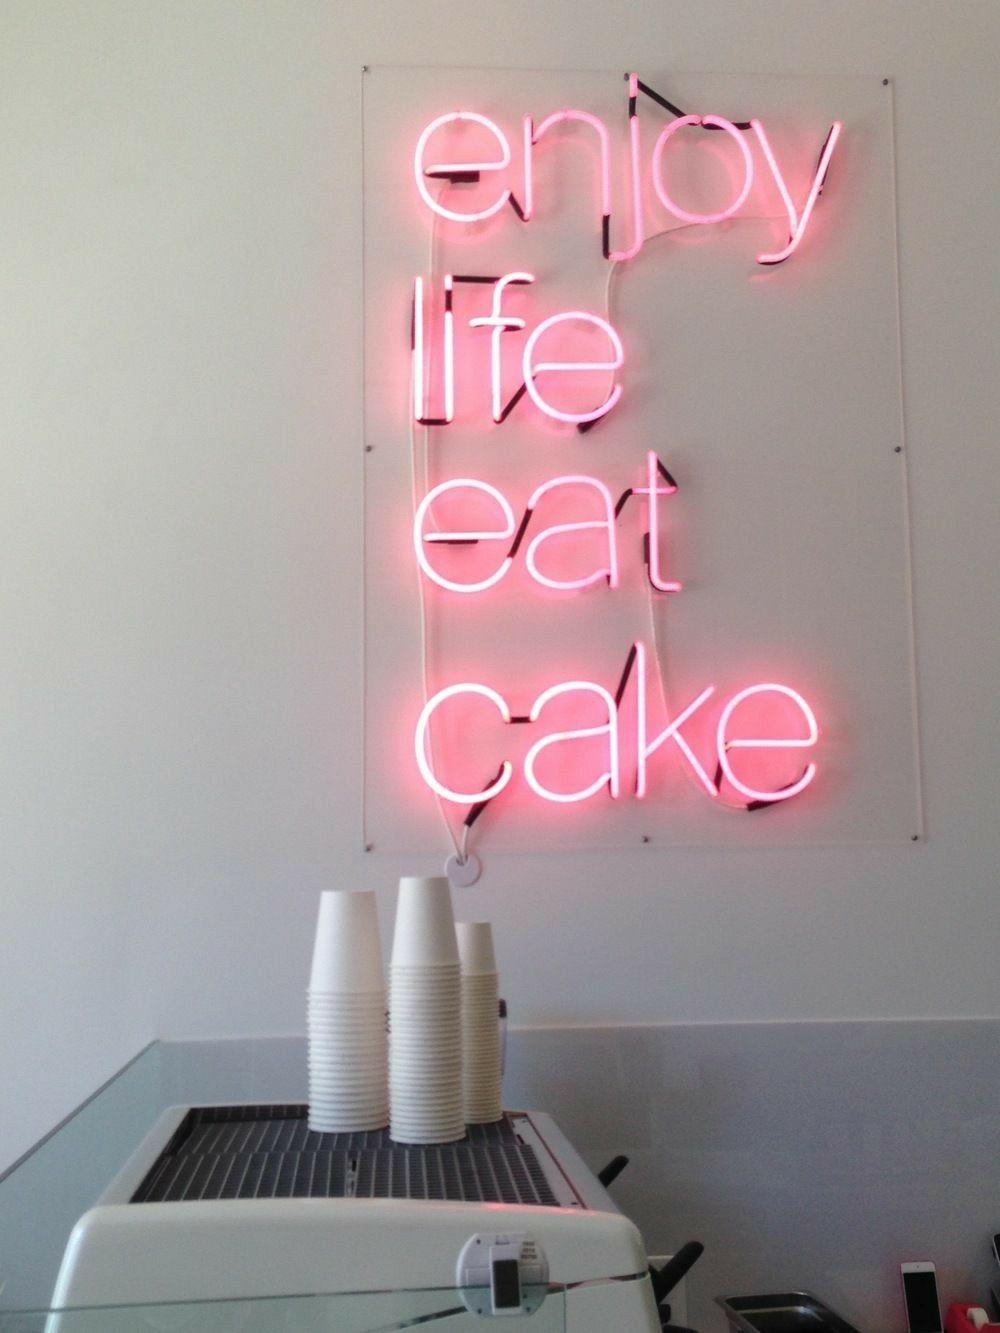 Meglio Neon O Led enjoy #life #eatcake #buythemakeup ~ neon lights add color